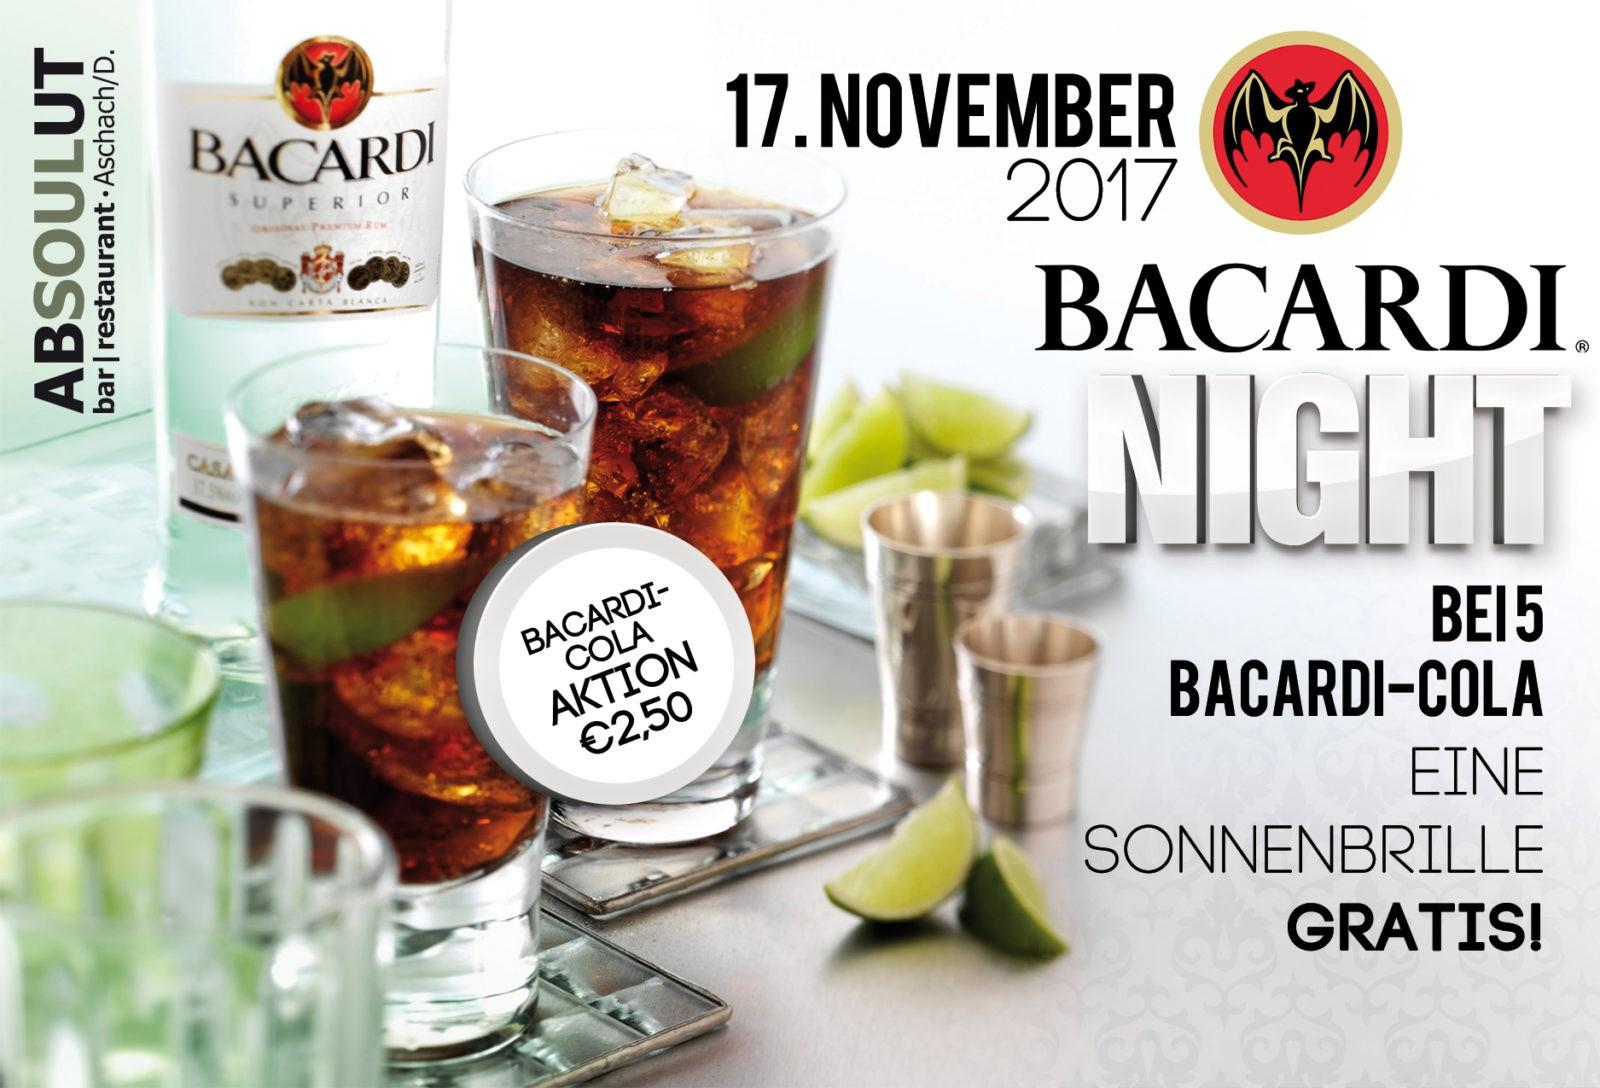 Absolut Bar Restaurant Events - Bacardi Night